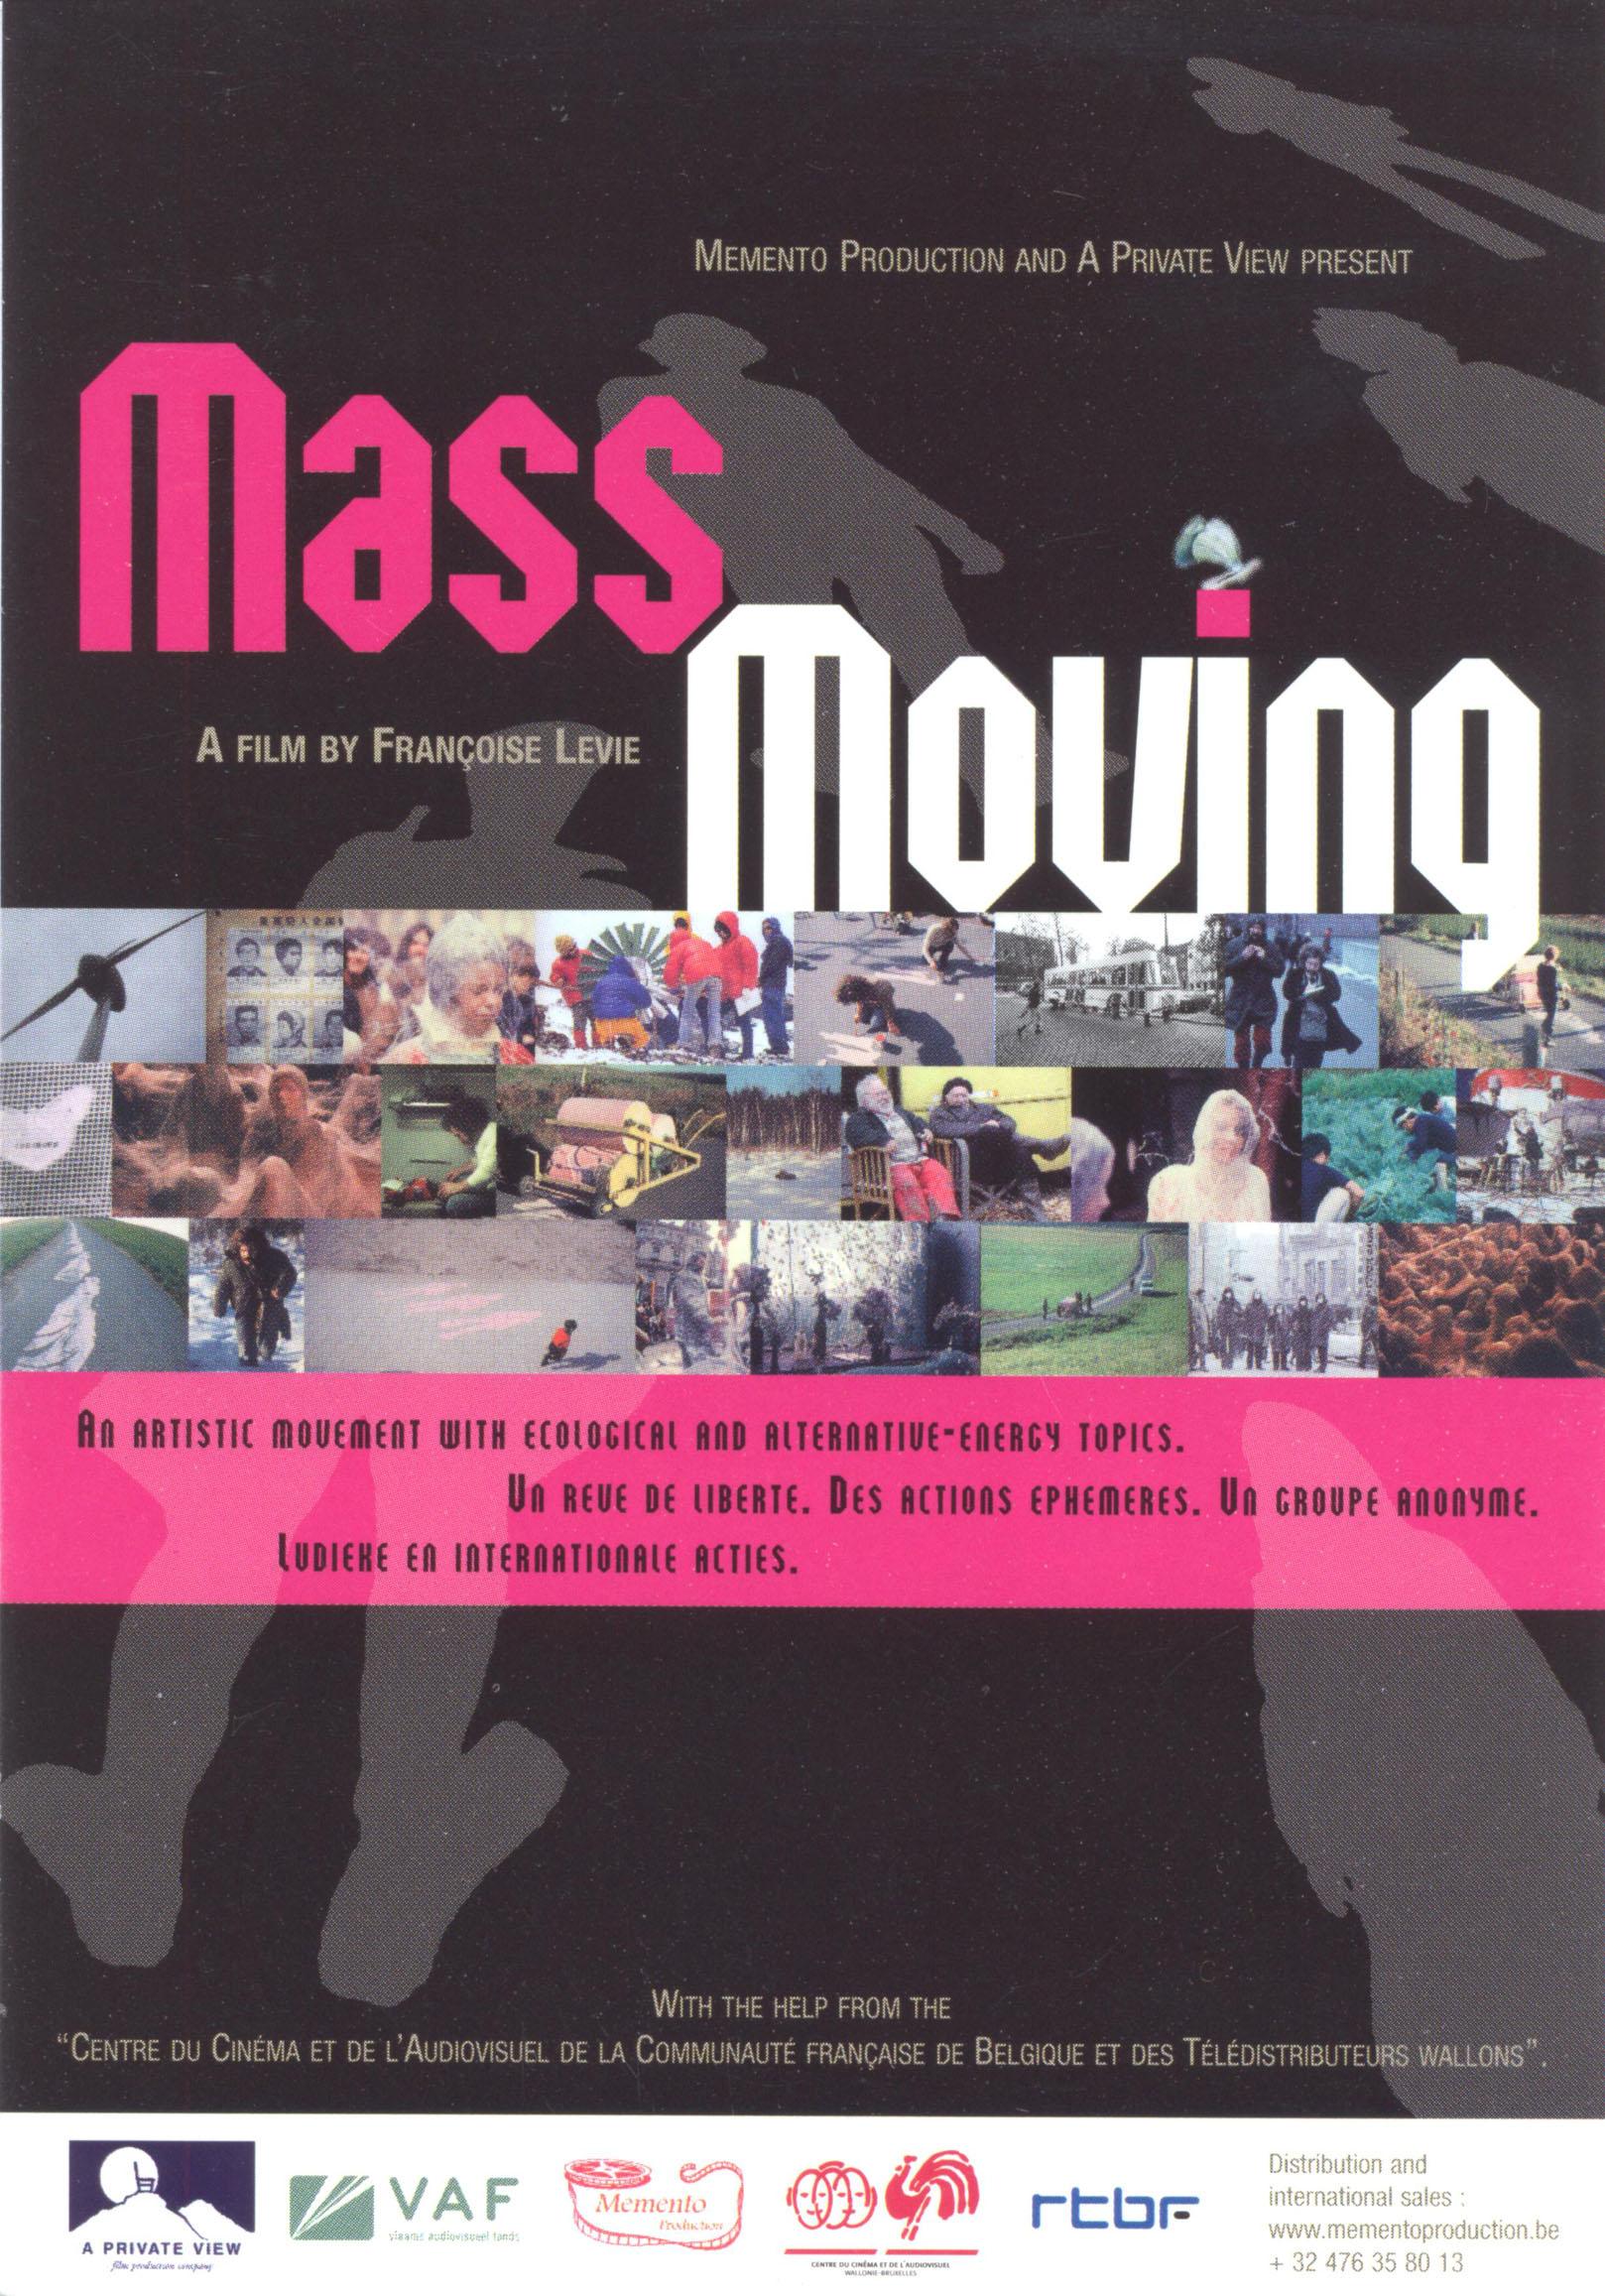 mass-moving-dvd.jpg - image/jpeg